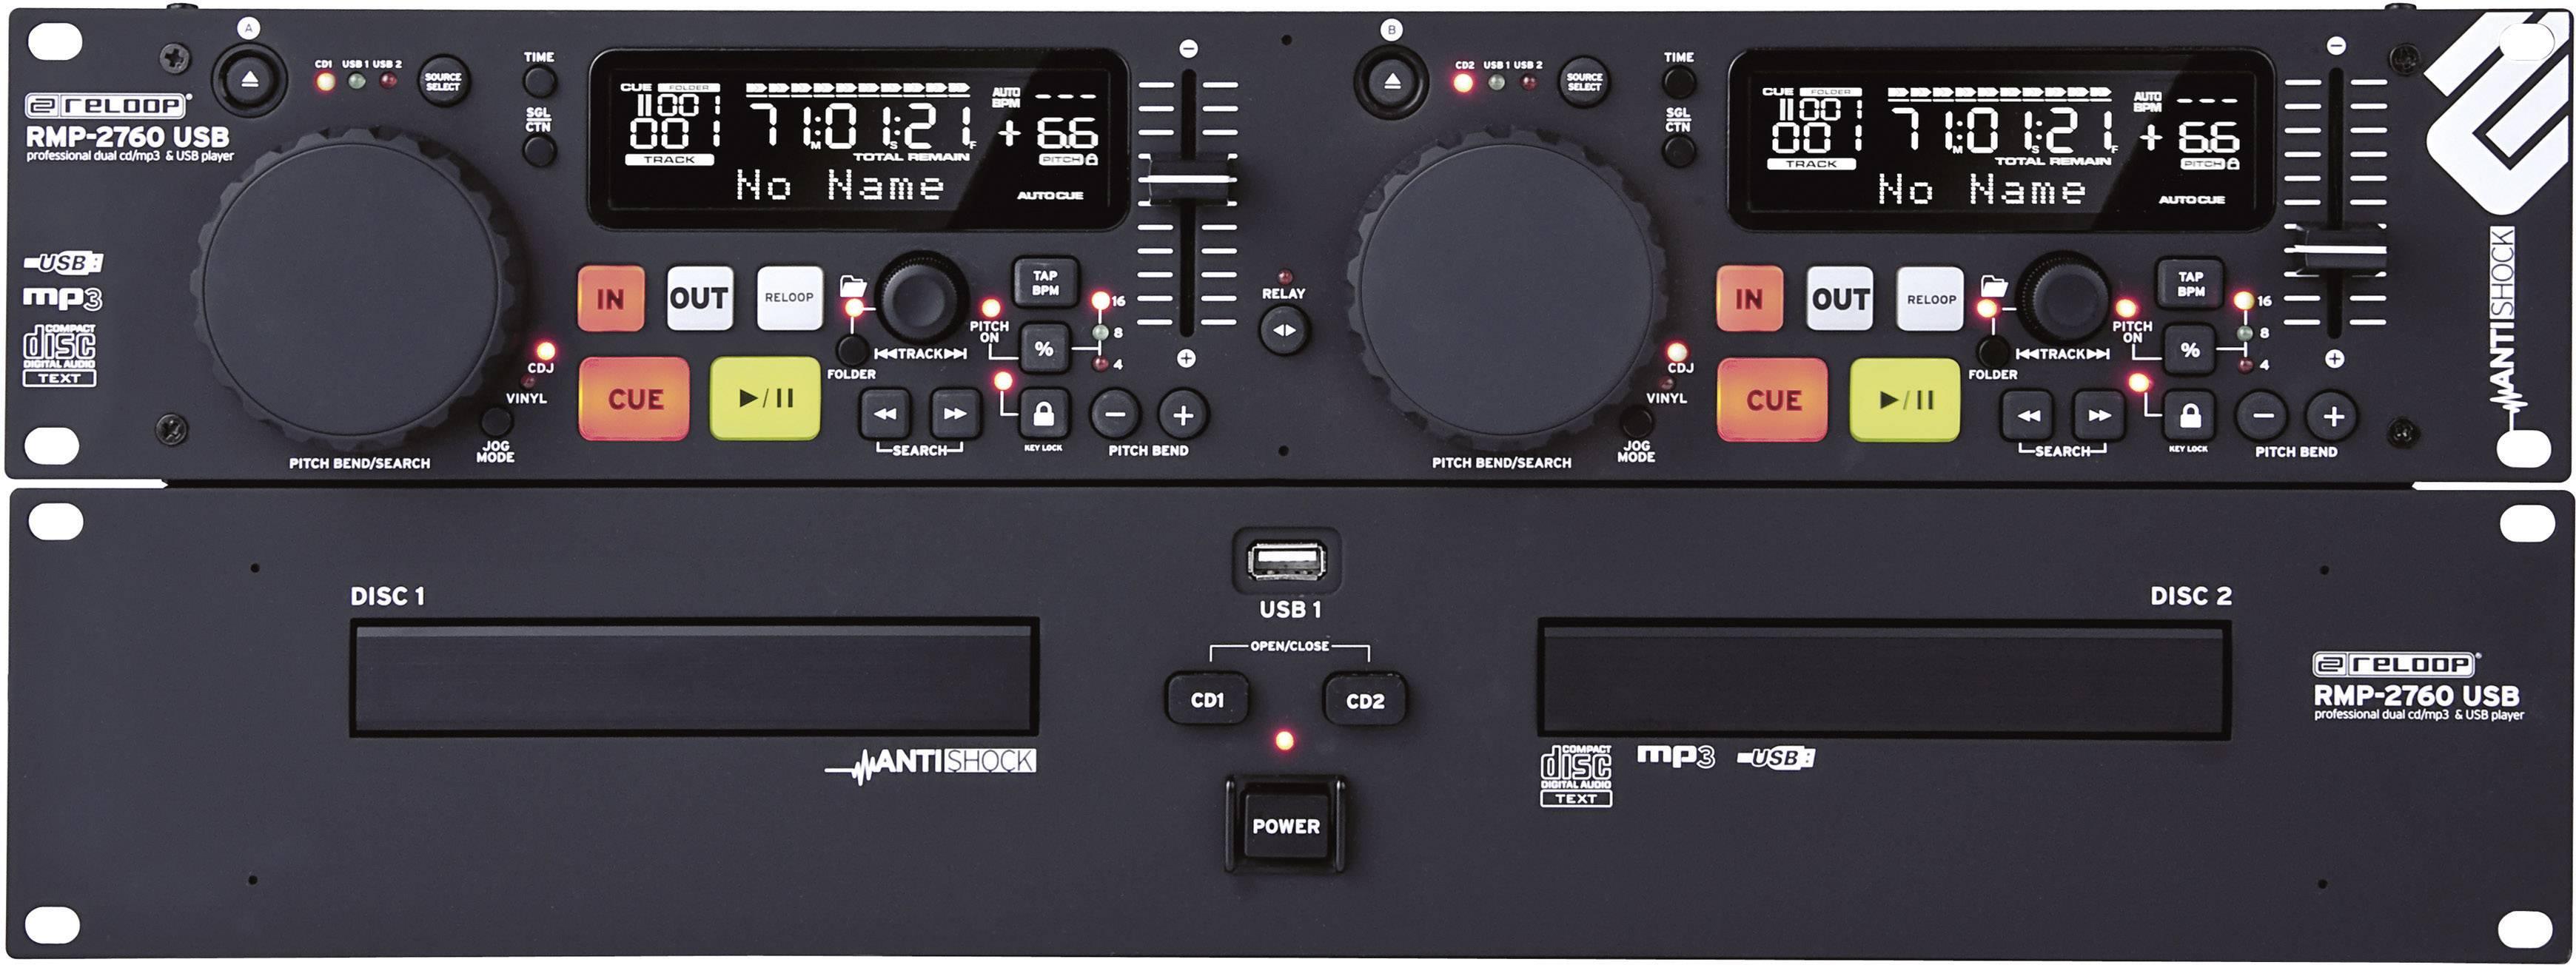 Dvojitý CD/MP3 přehrávač Reloop RMP-2760